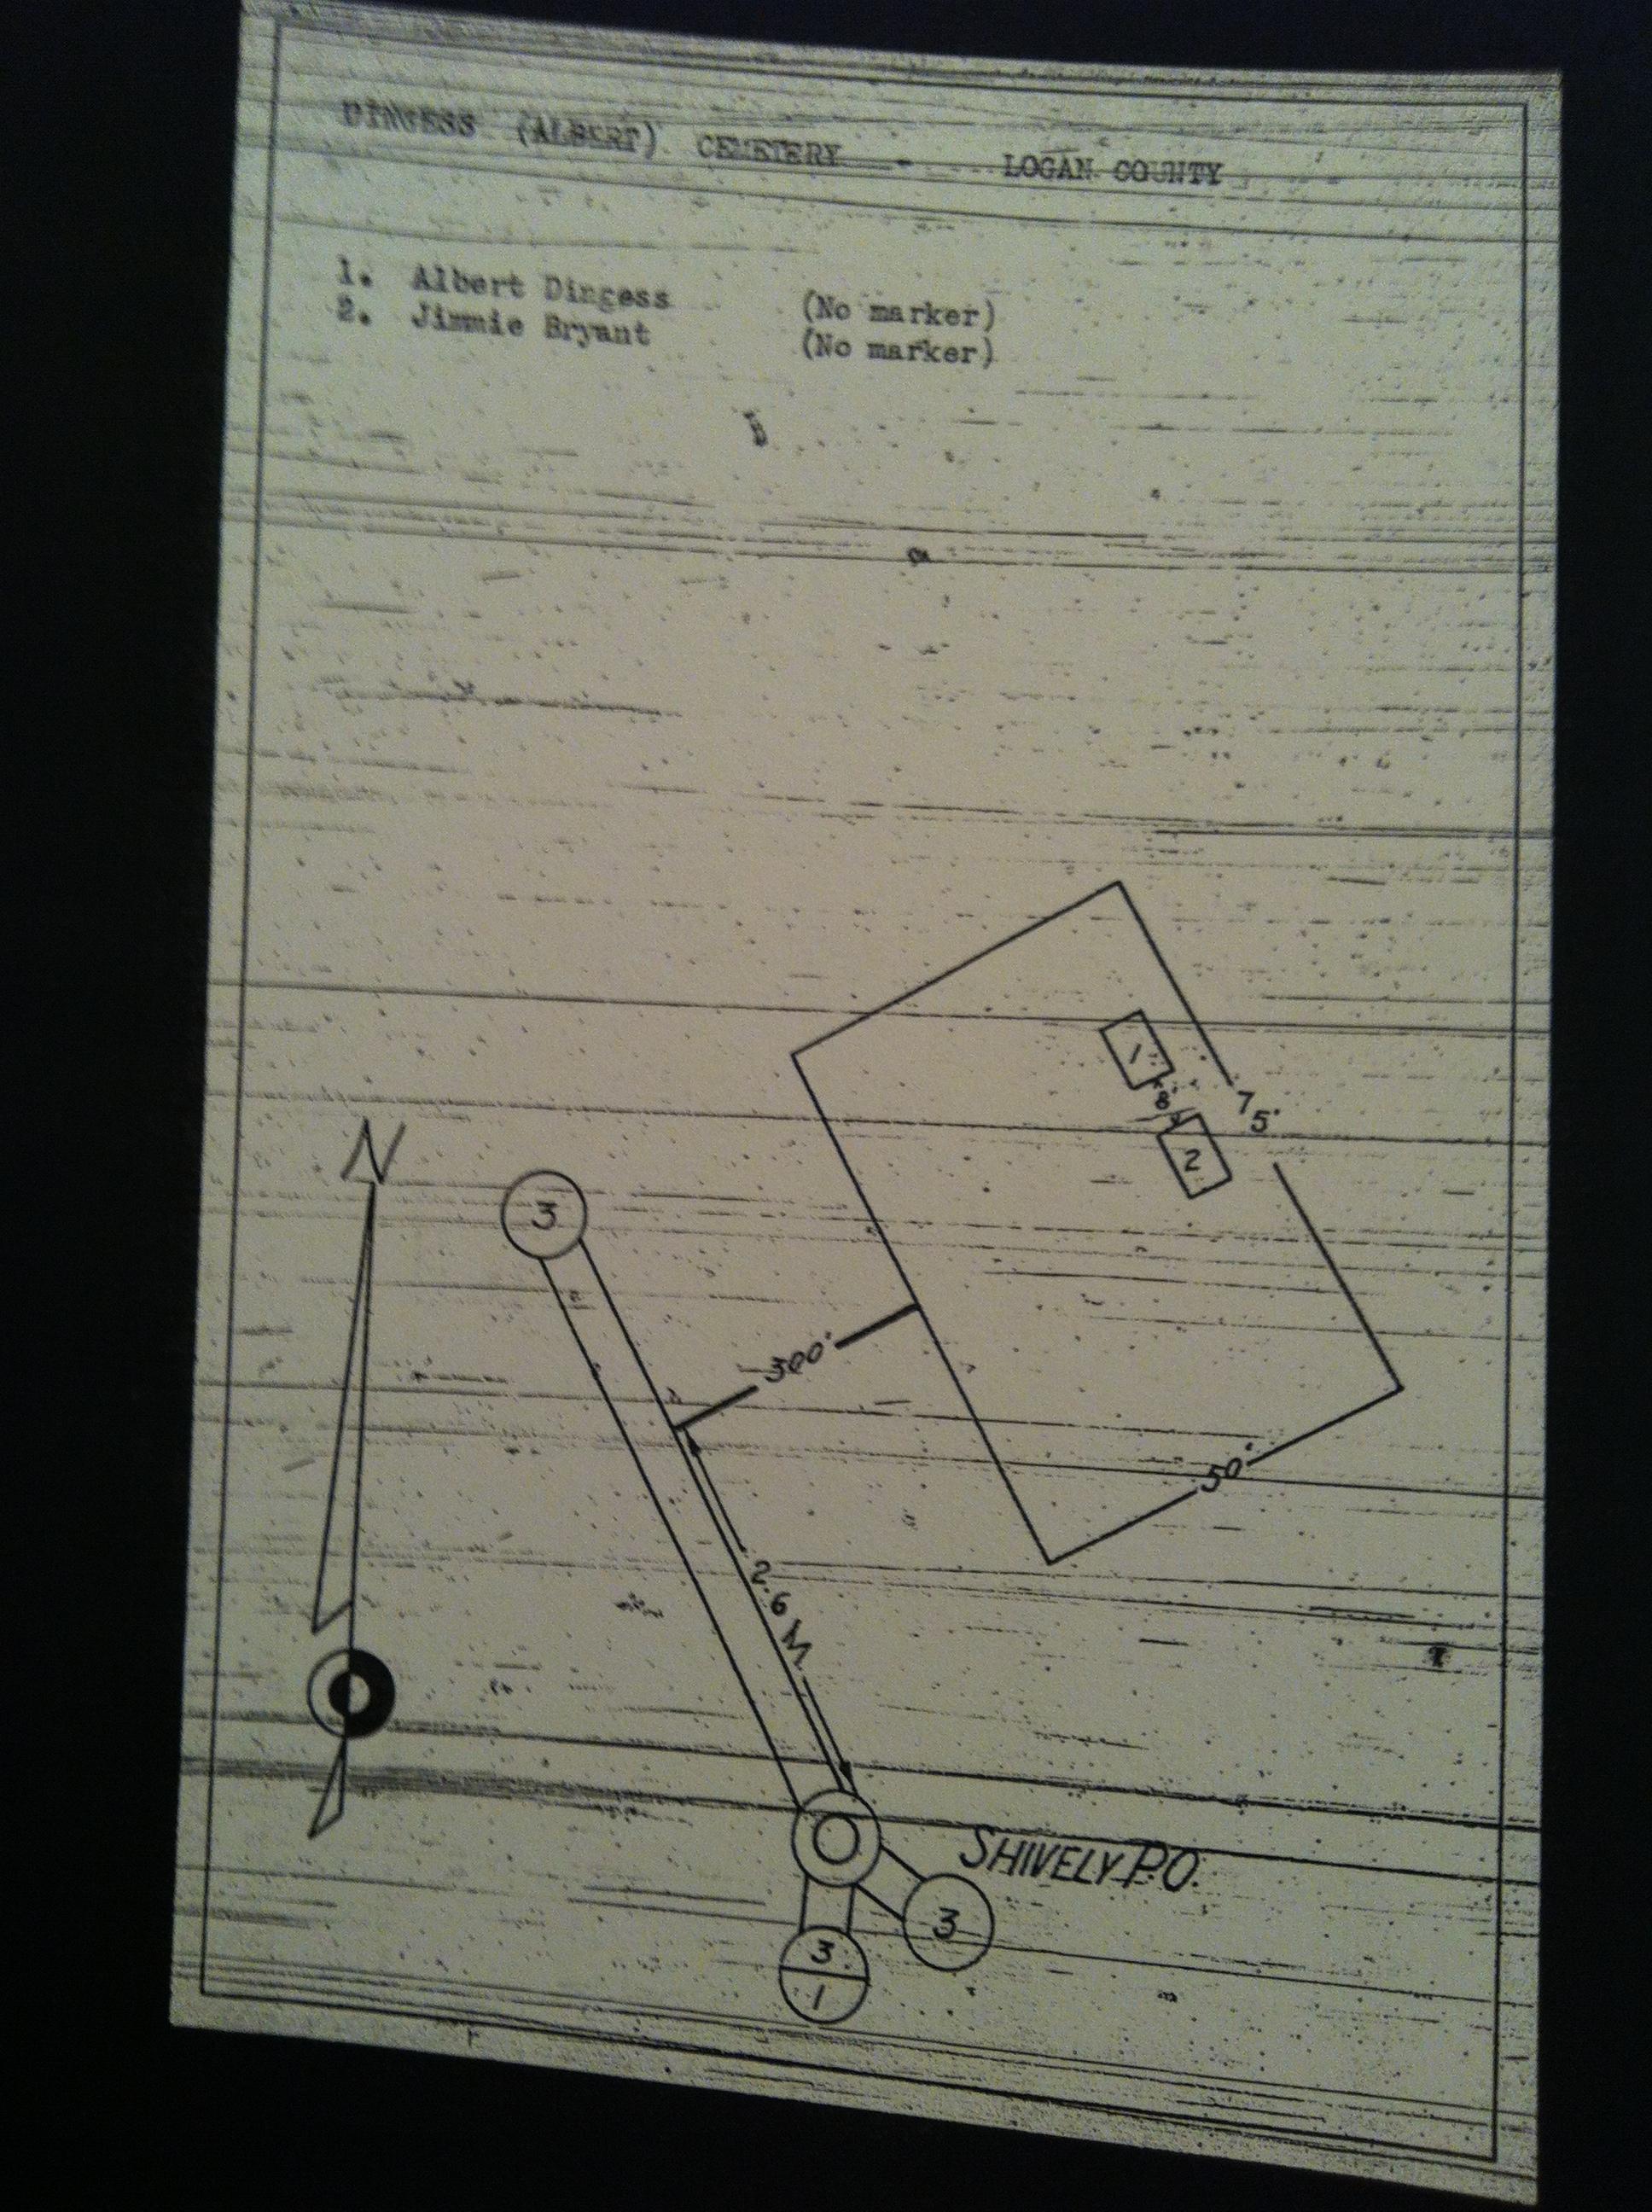 Albert Dingess Cemetery Map